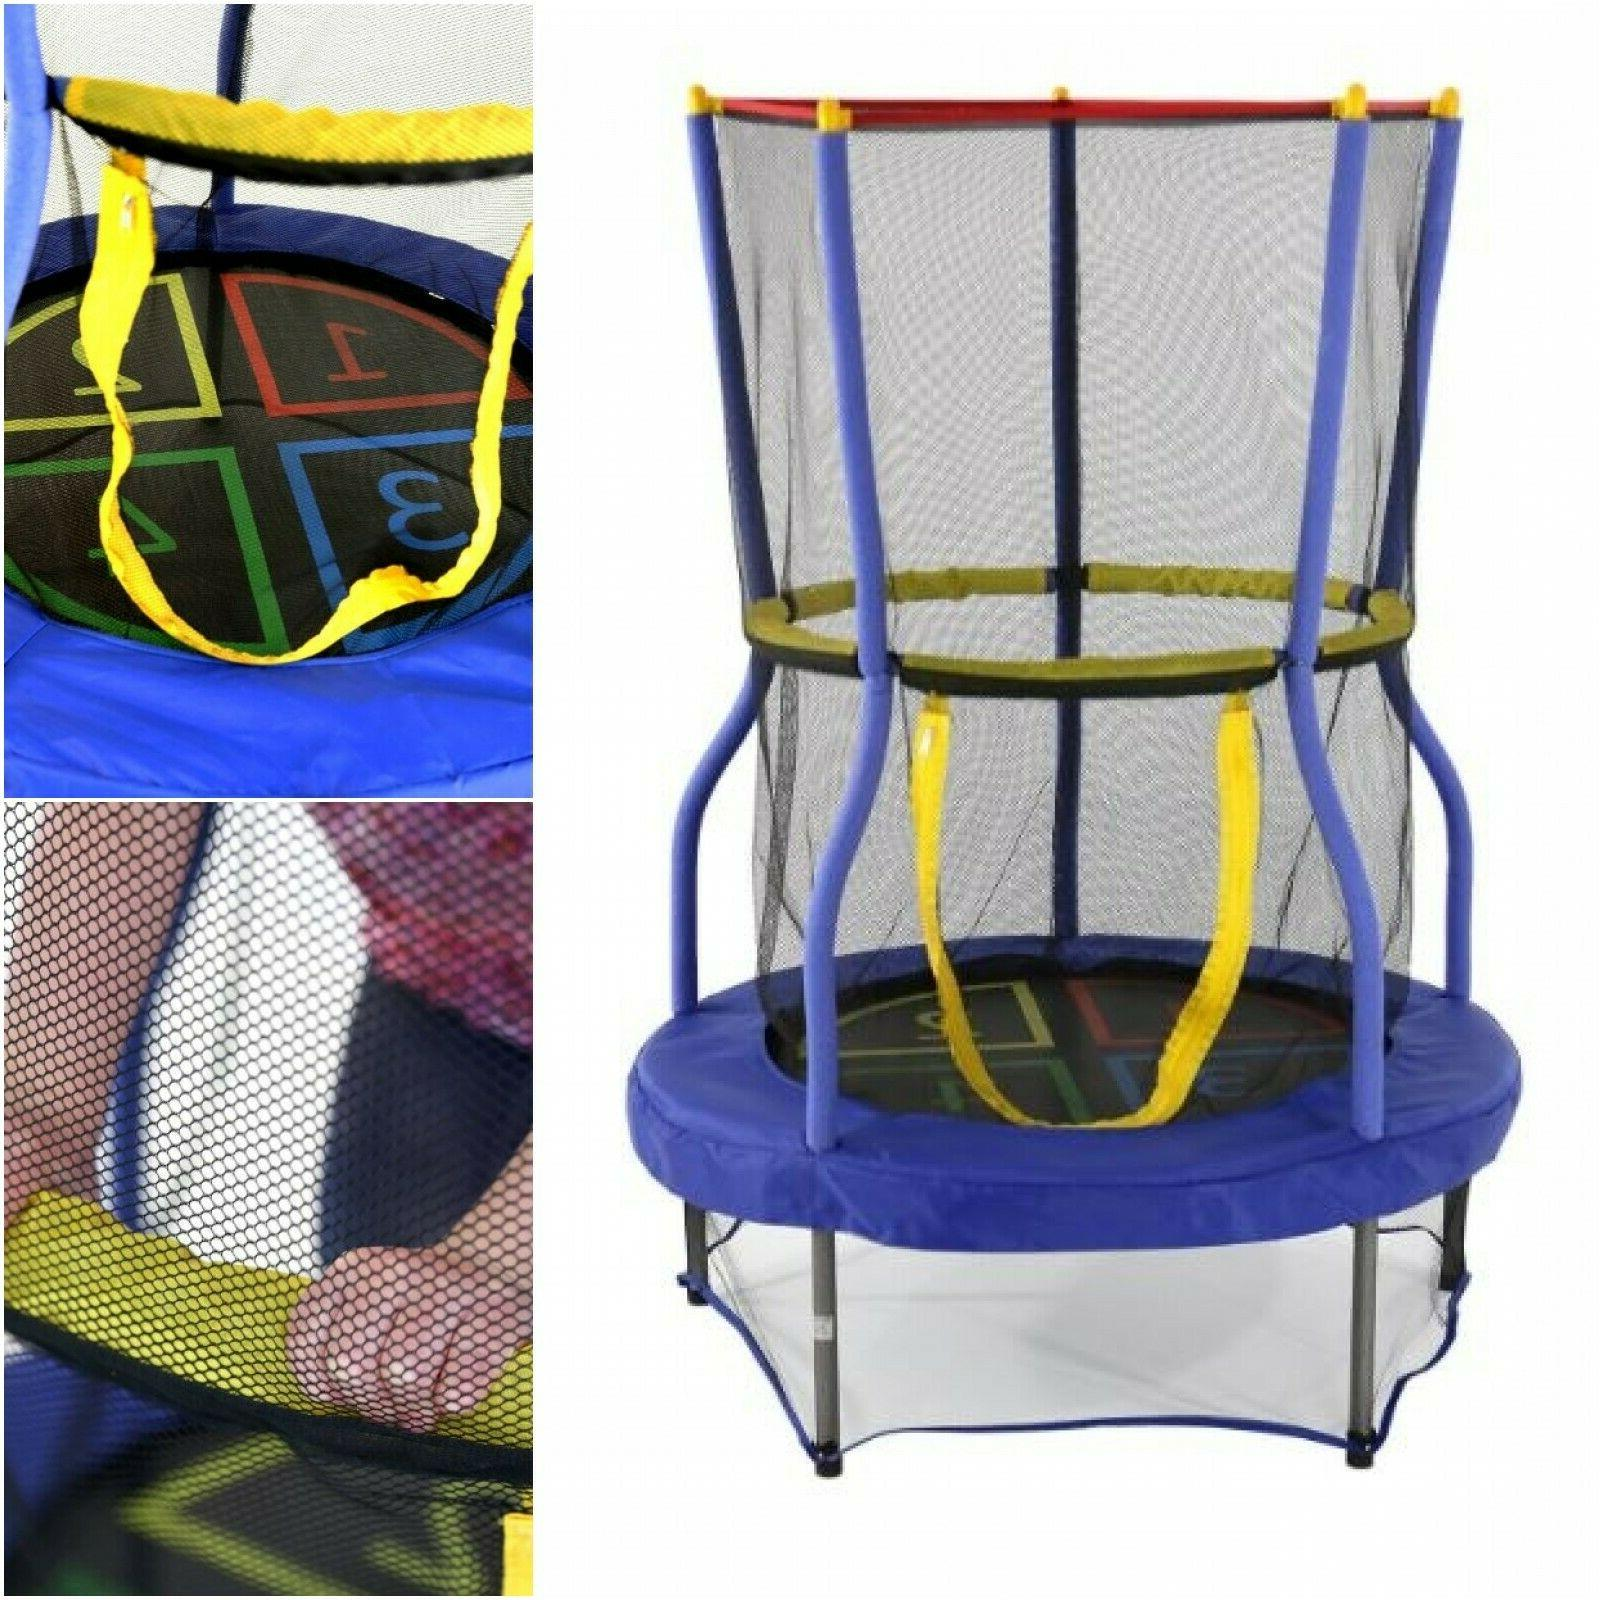 Trampoline Child Enclosure Jump